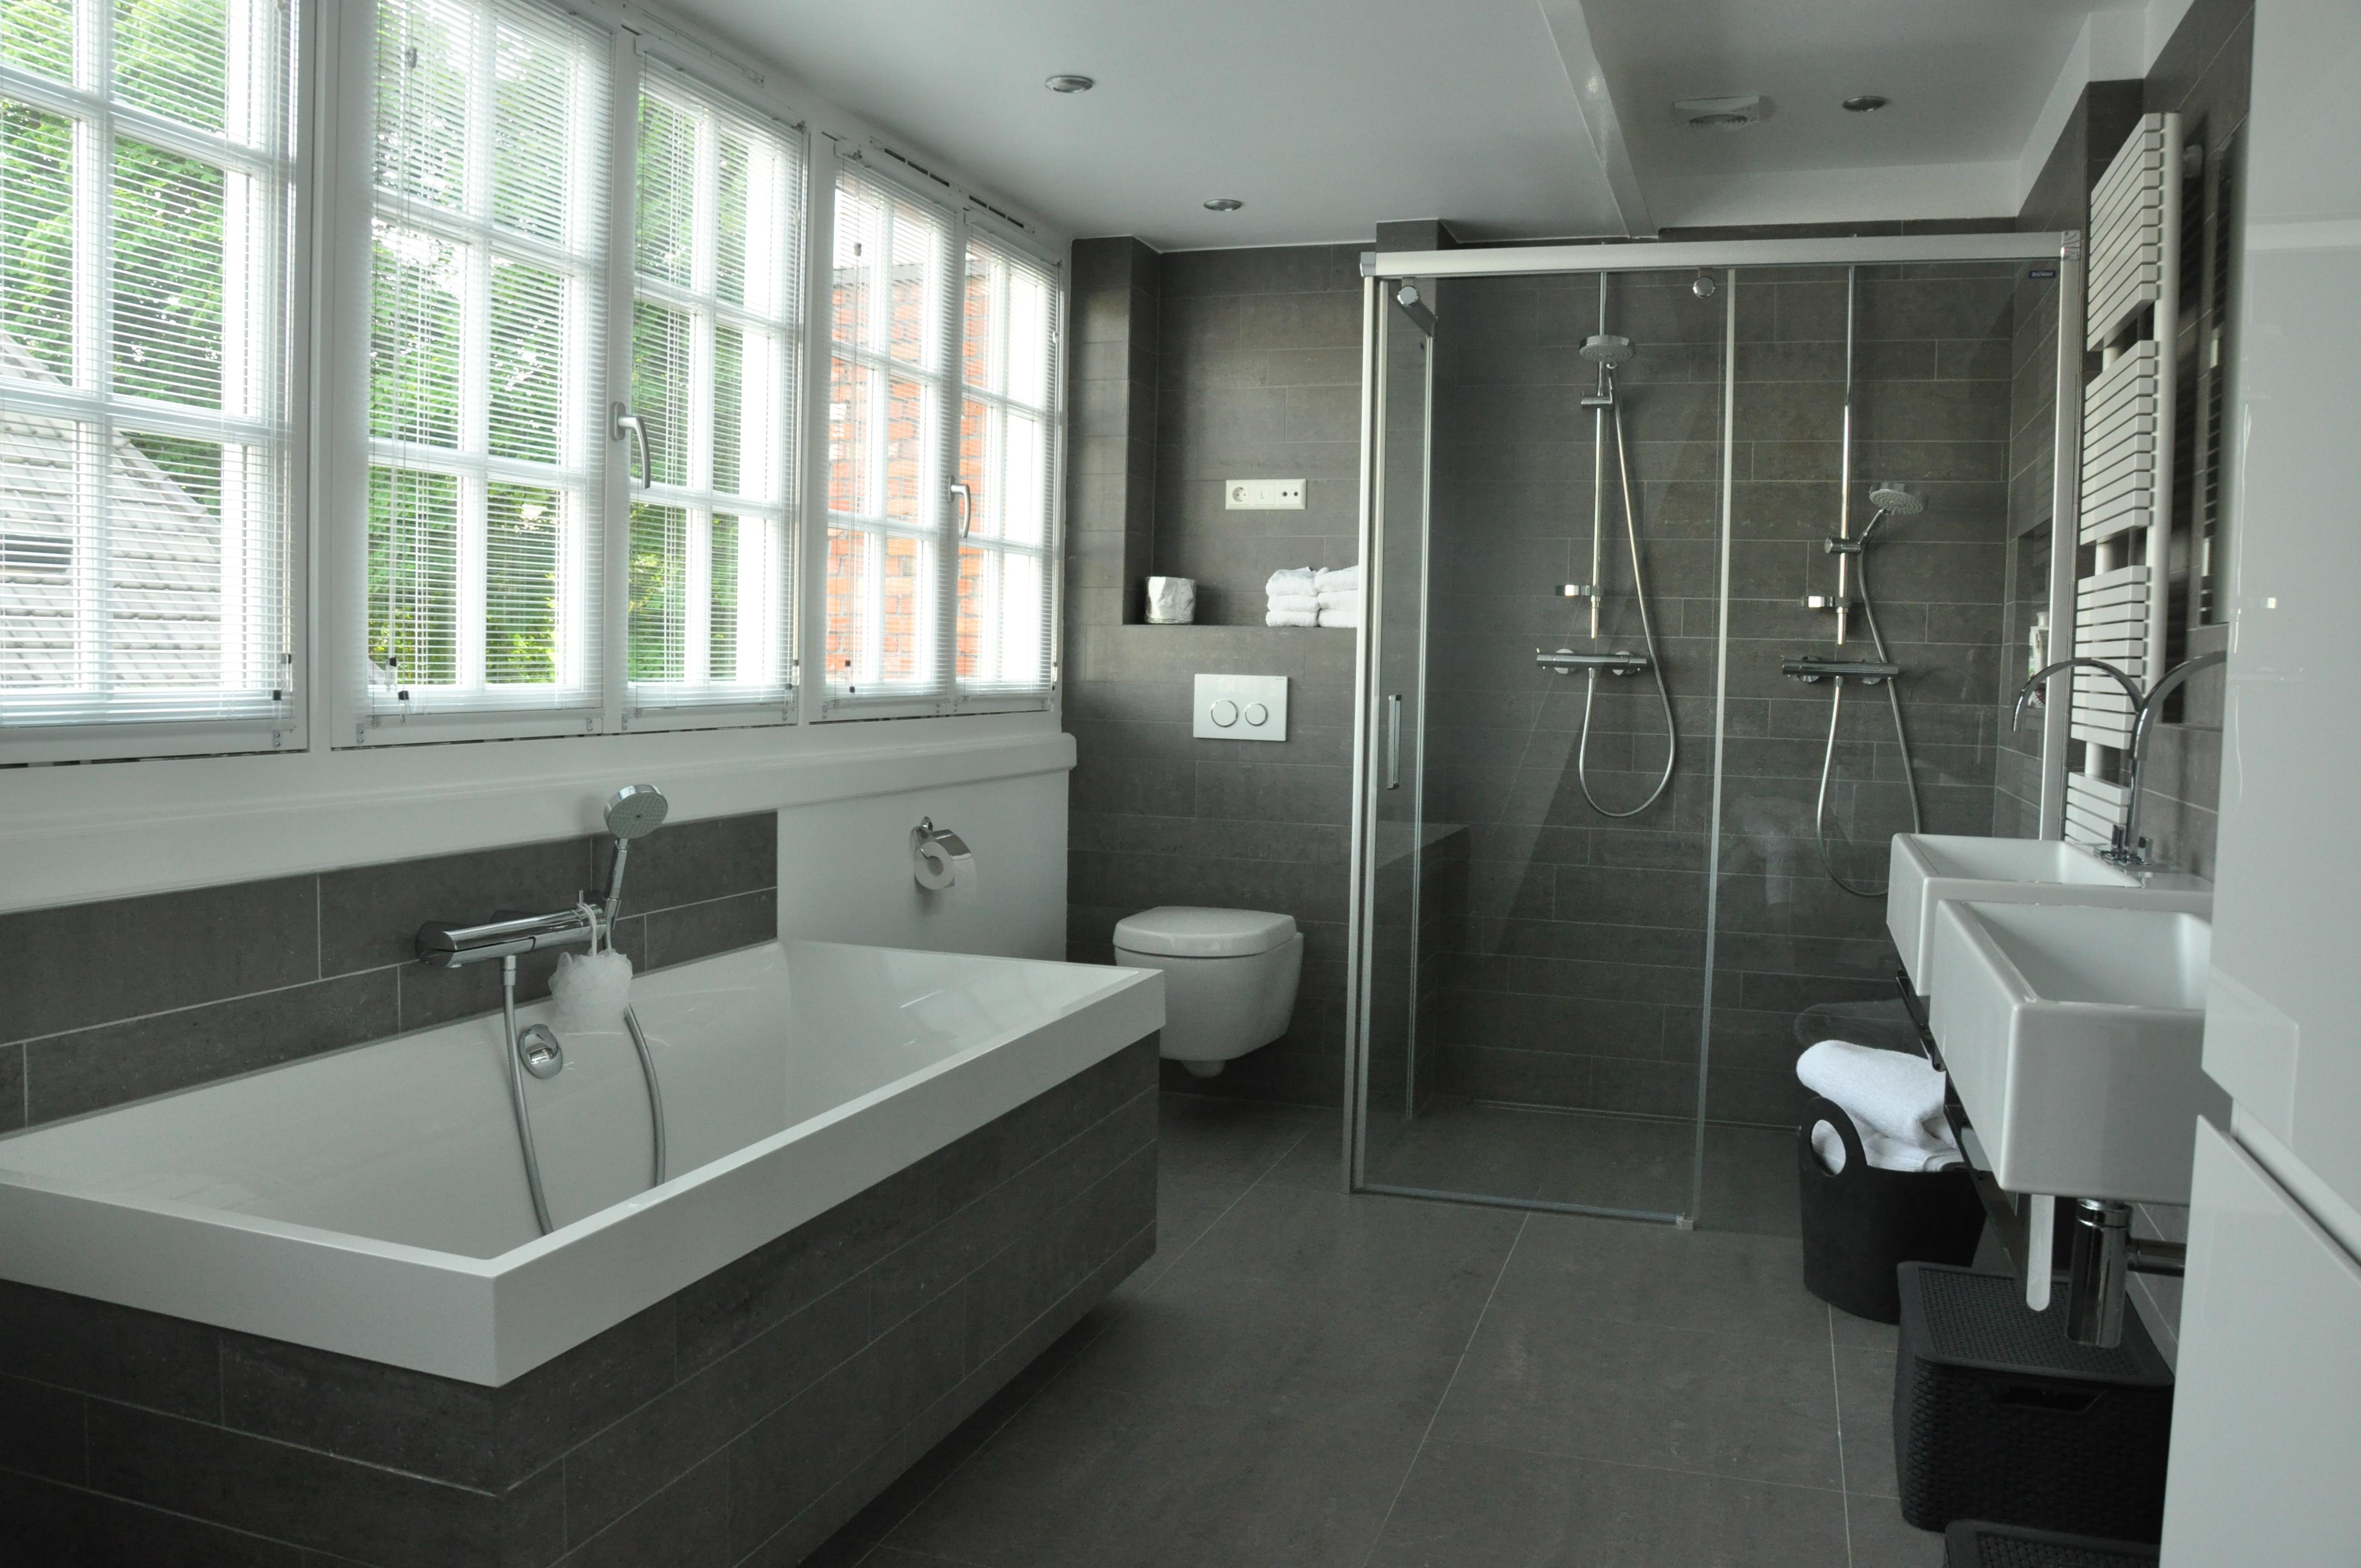 Badkamer vanwoonhuisnaardroomhuis for Badkamer ruimte